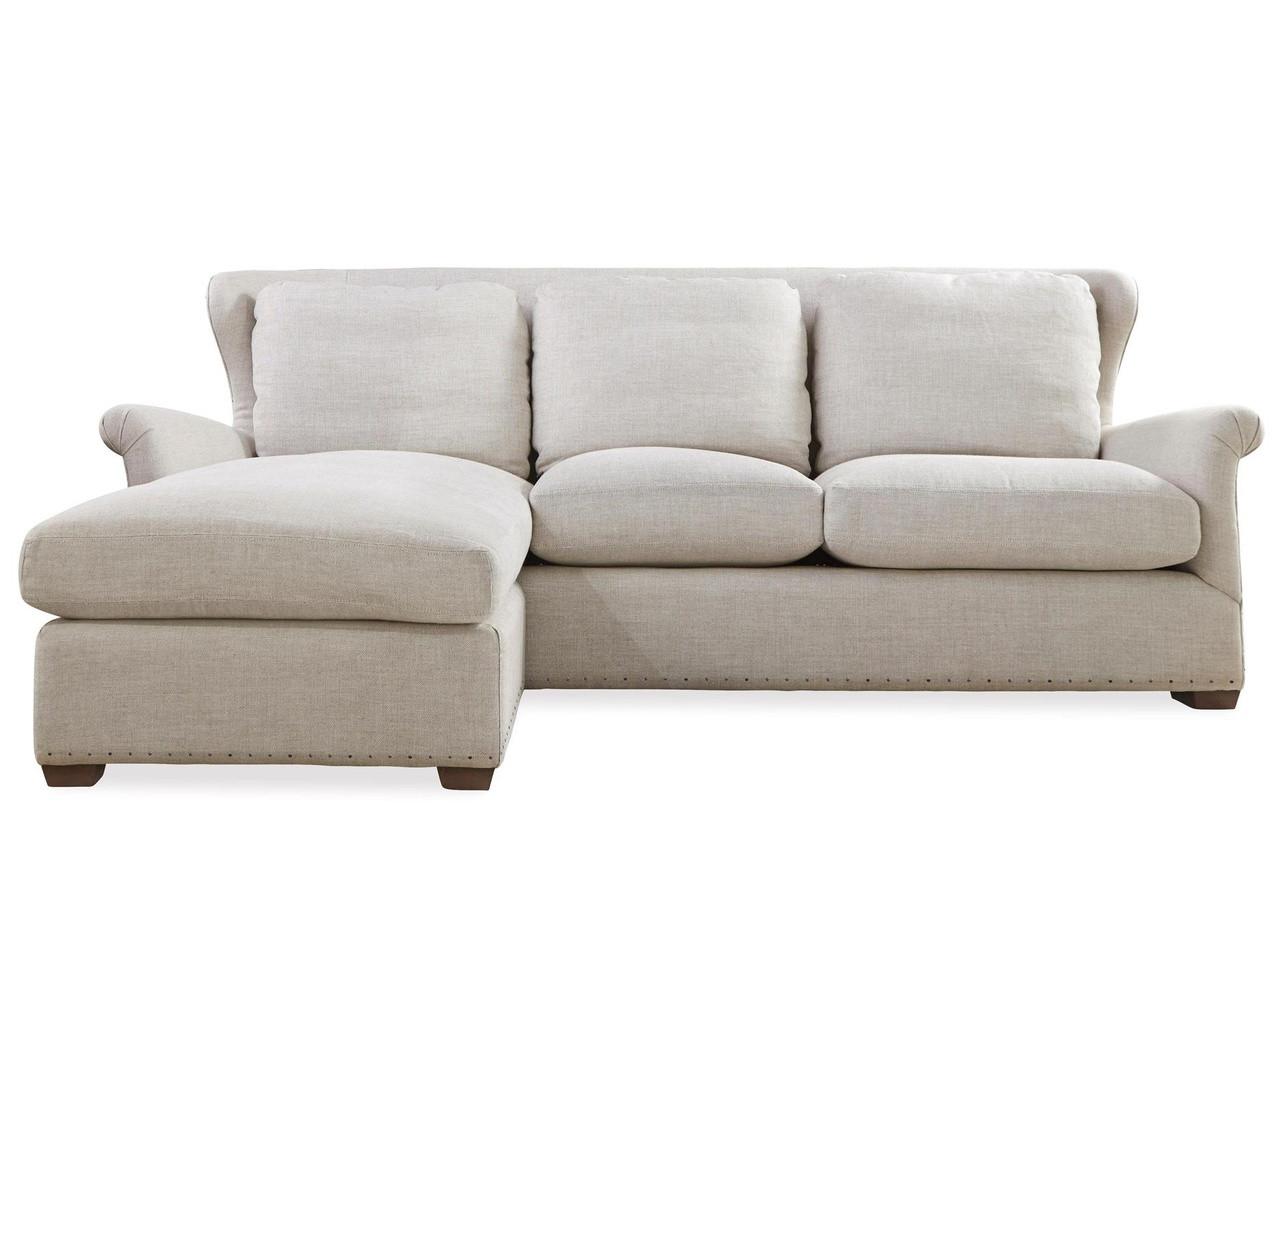 Haven Belgian Linen Upholstered Wingback Sectional Sofa Zin Home